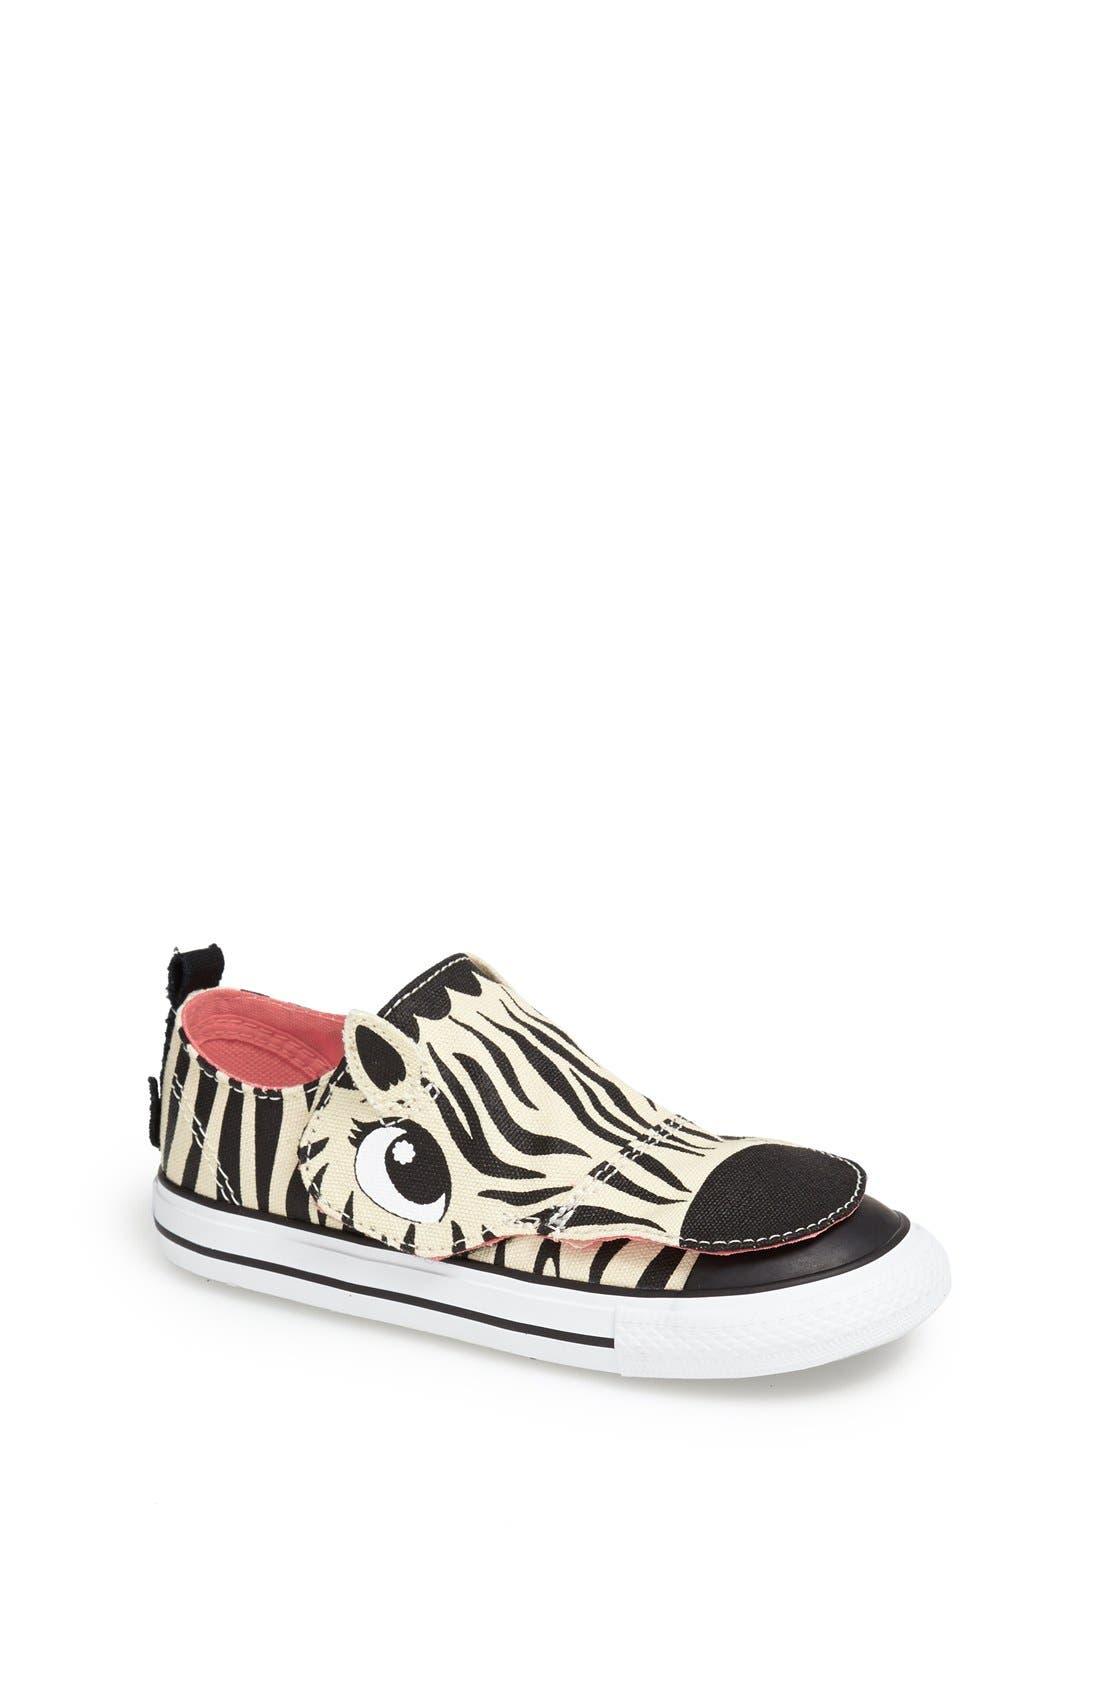 Main Image - Converse 'No Problem' Zebra Face Sneaker (Baby, Walker & Toddler)